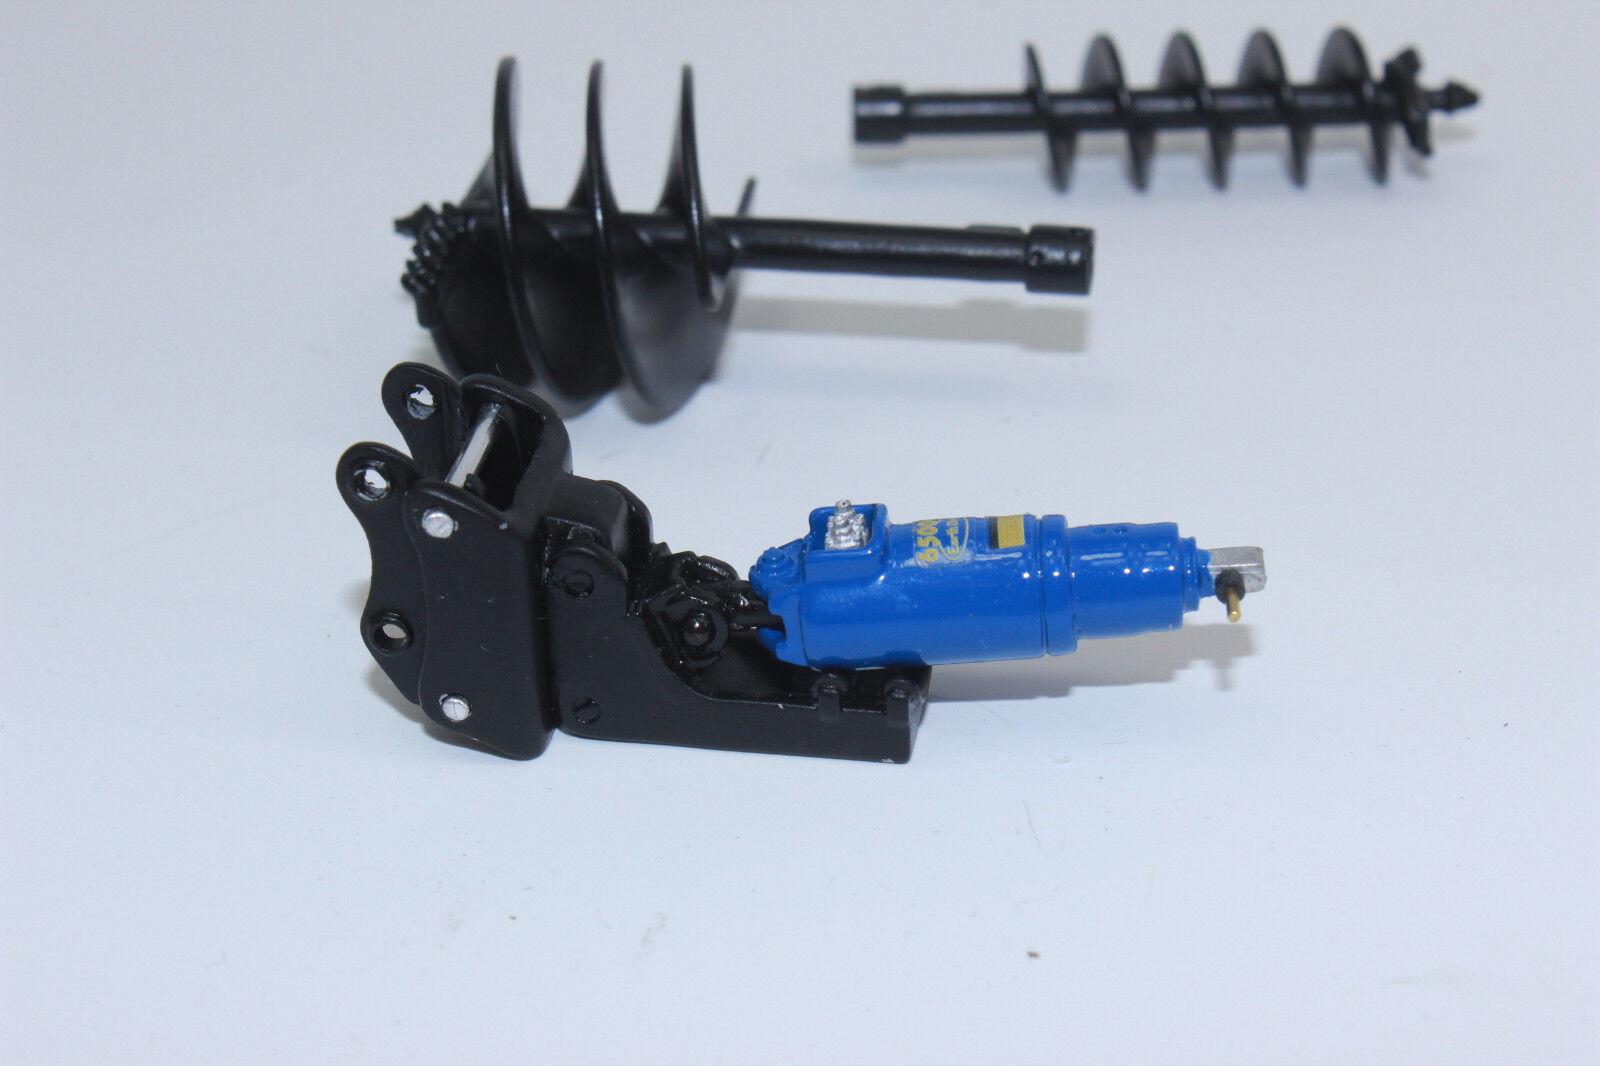 GAZ Evans Evans Evans GF 75 AugerTorque 65000 Erdbohrer Drill + 2 Bohrer 1 50 NEU in OVP 7fa5fd